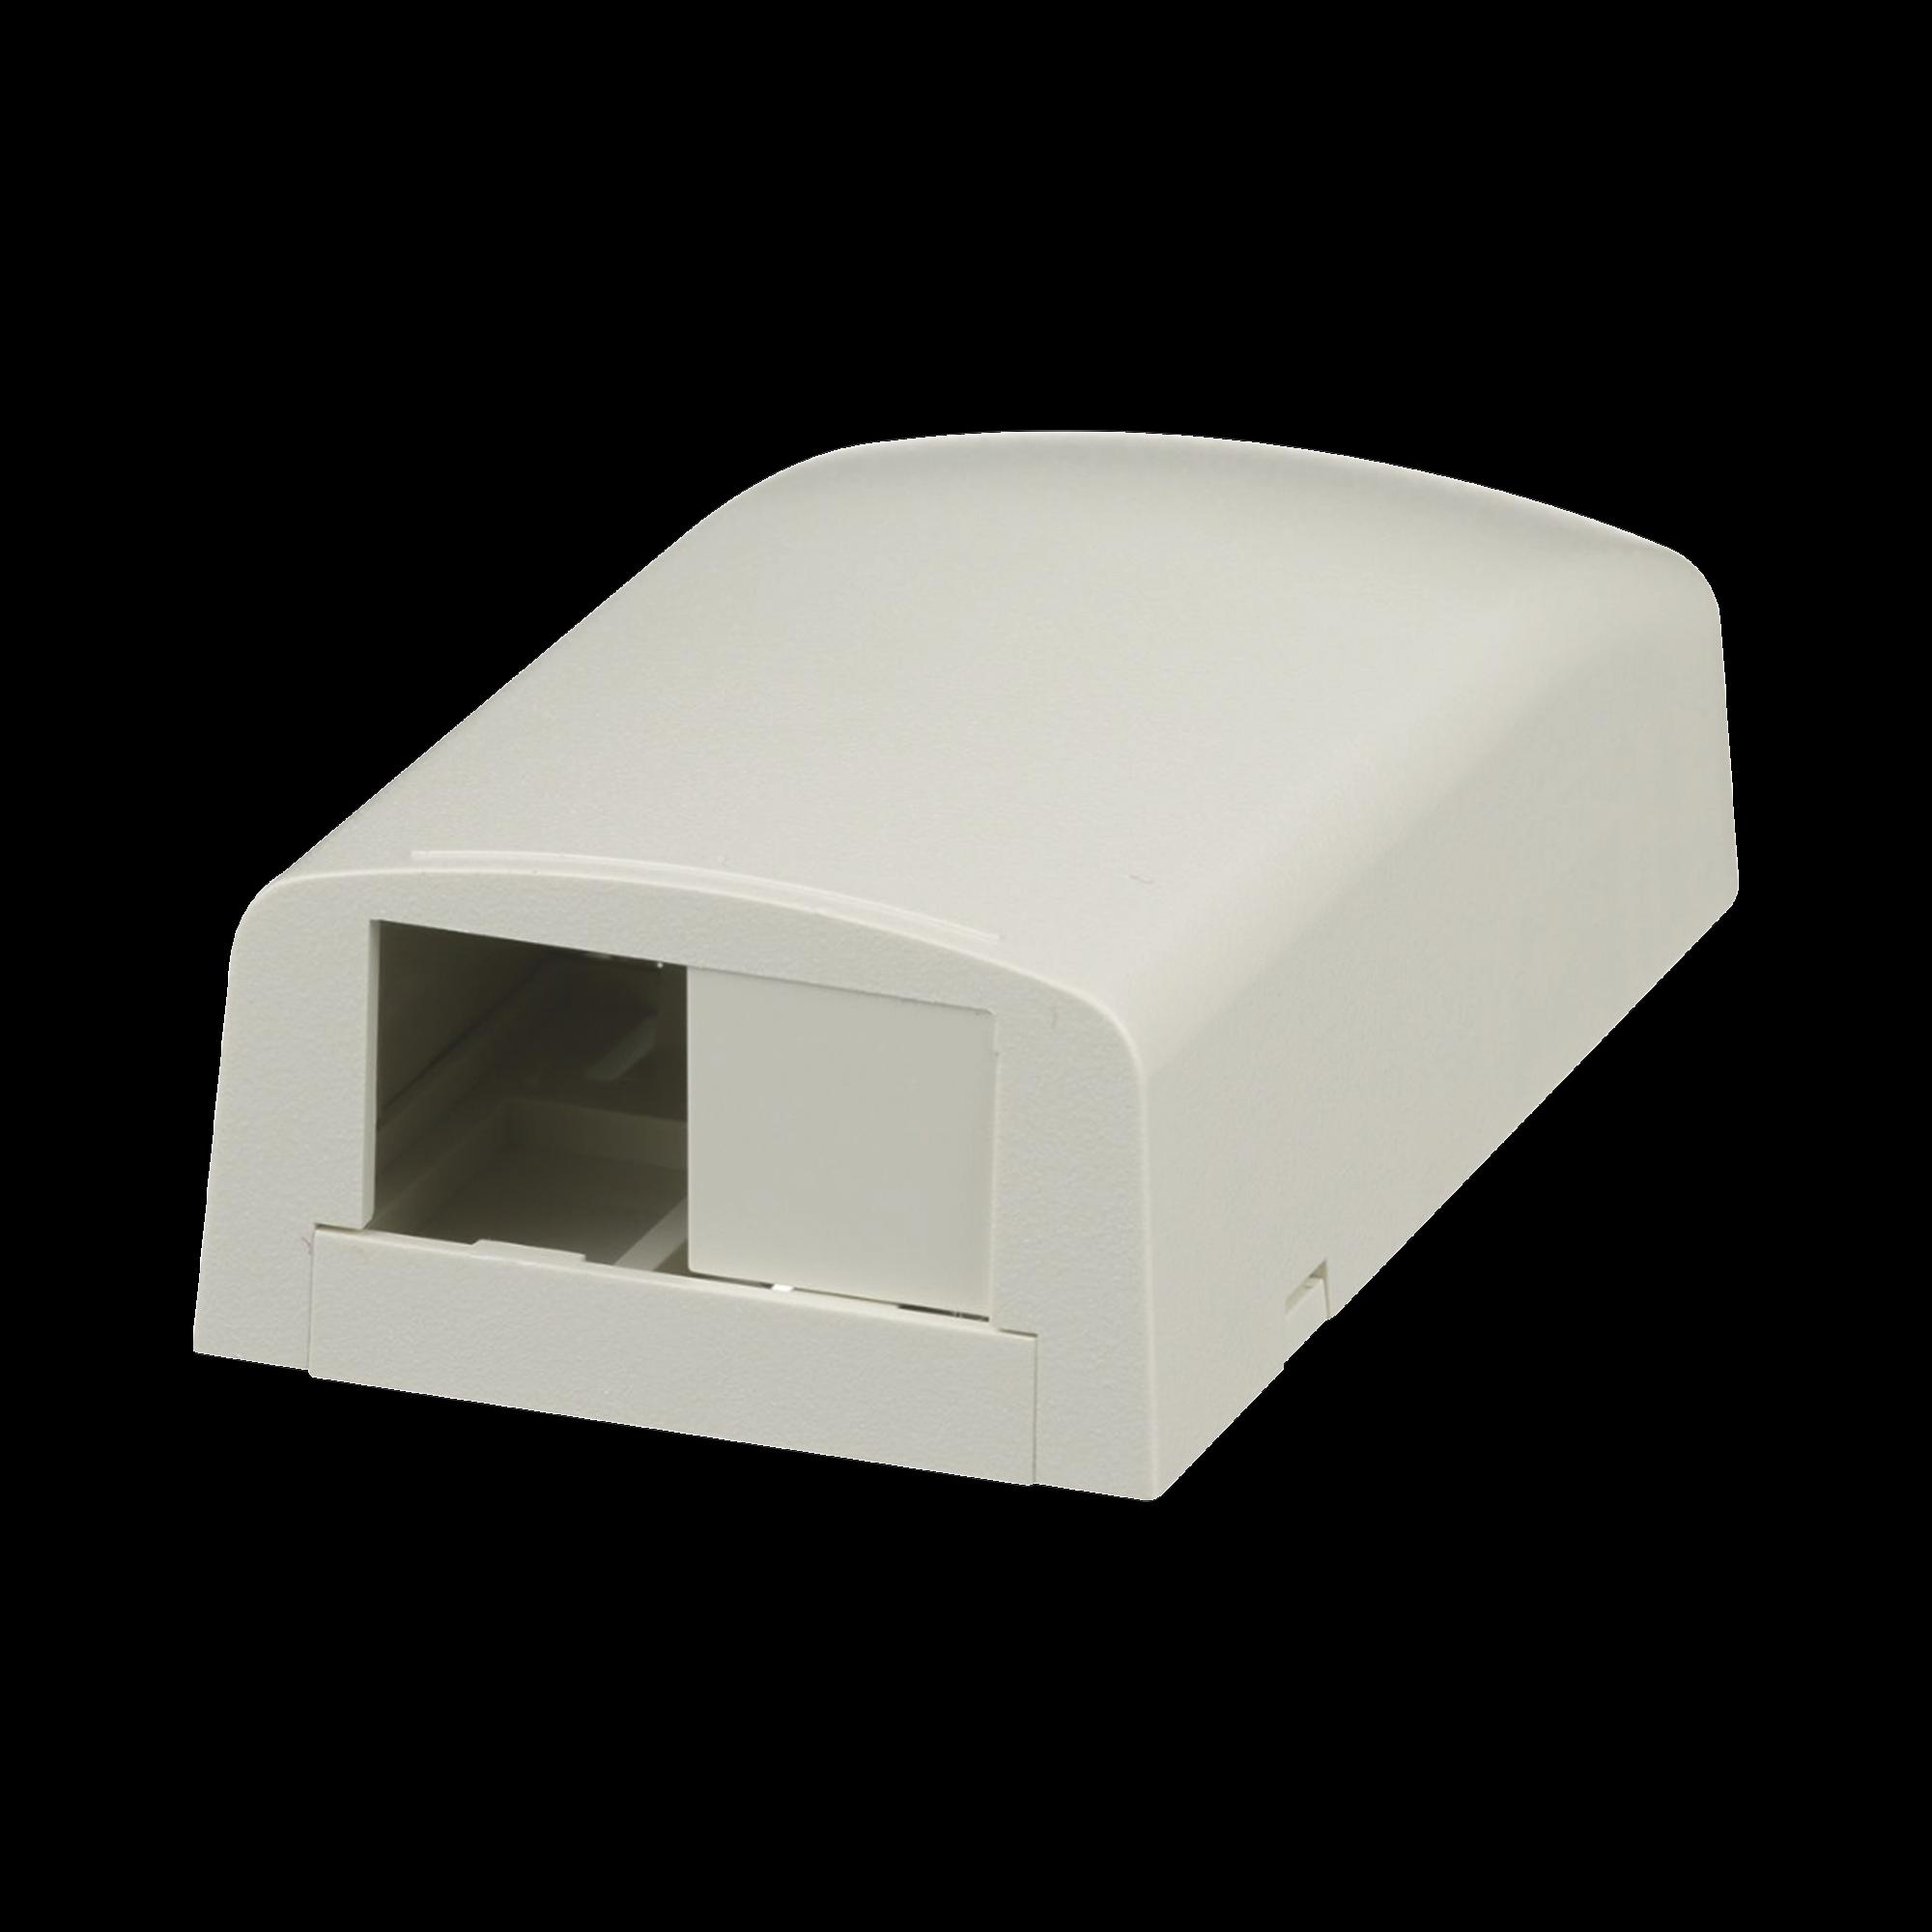 Caja de Montaje en Superficie, Para 2 Módulos Mini-Com, Color Blanco Mate